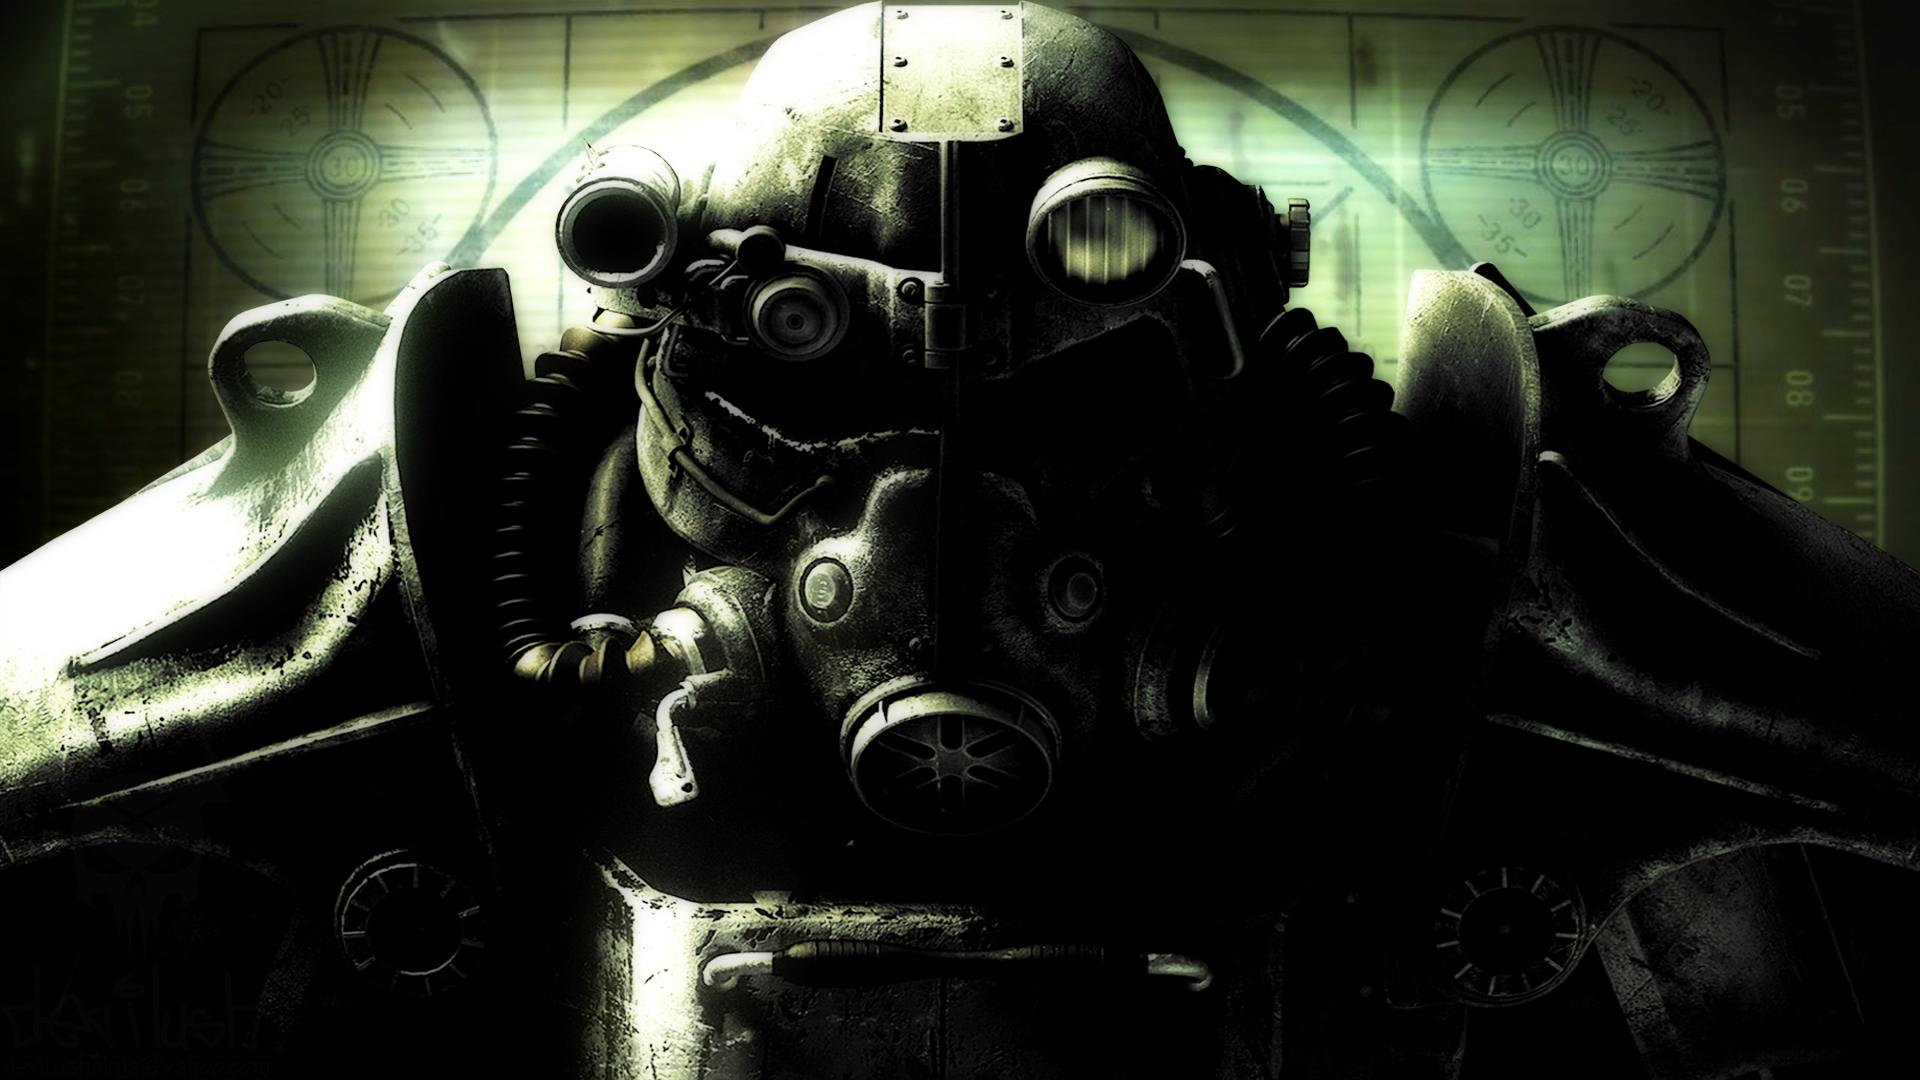 Fallout Brotherhood Wallpaper 1920x1080 Fallout Brotherhood Of 1920x1080